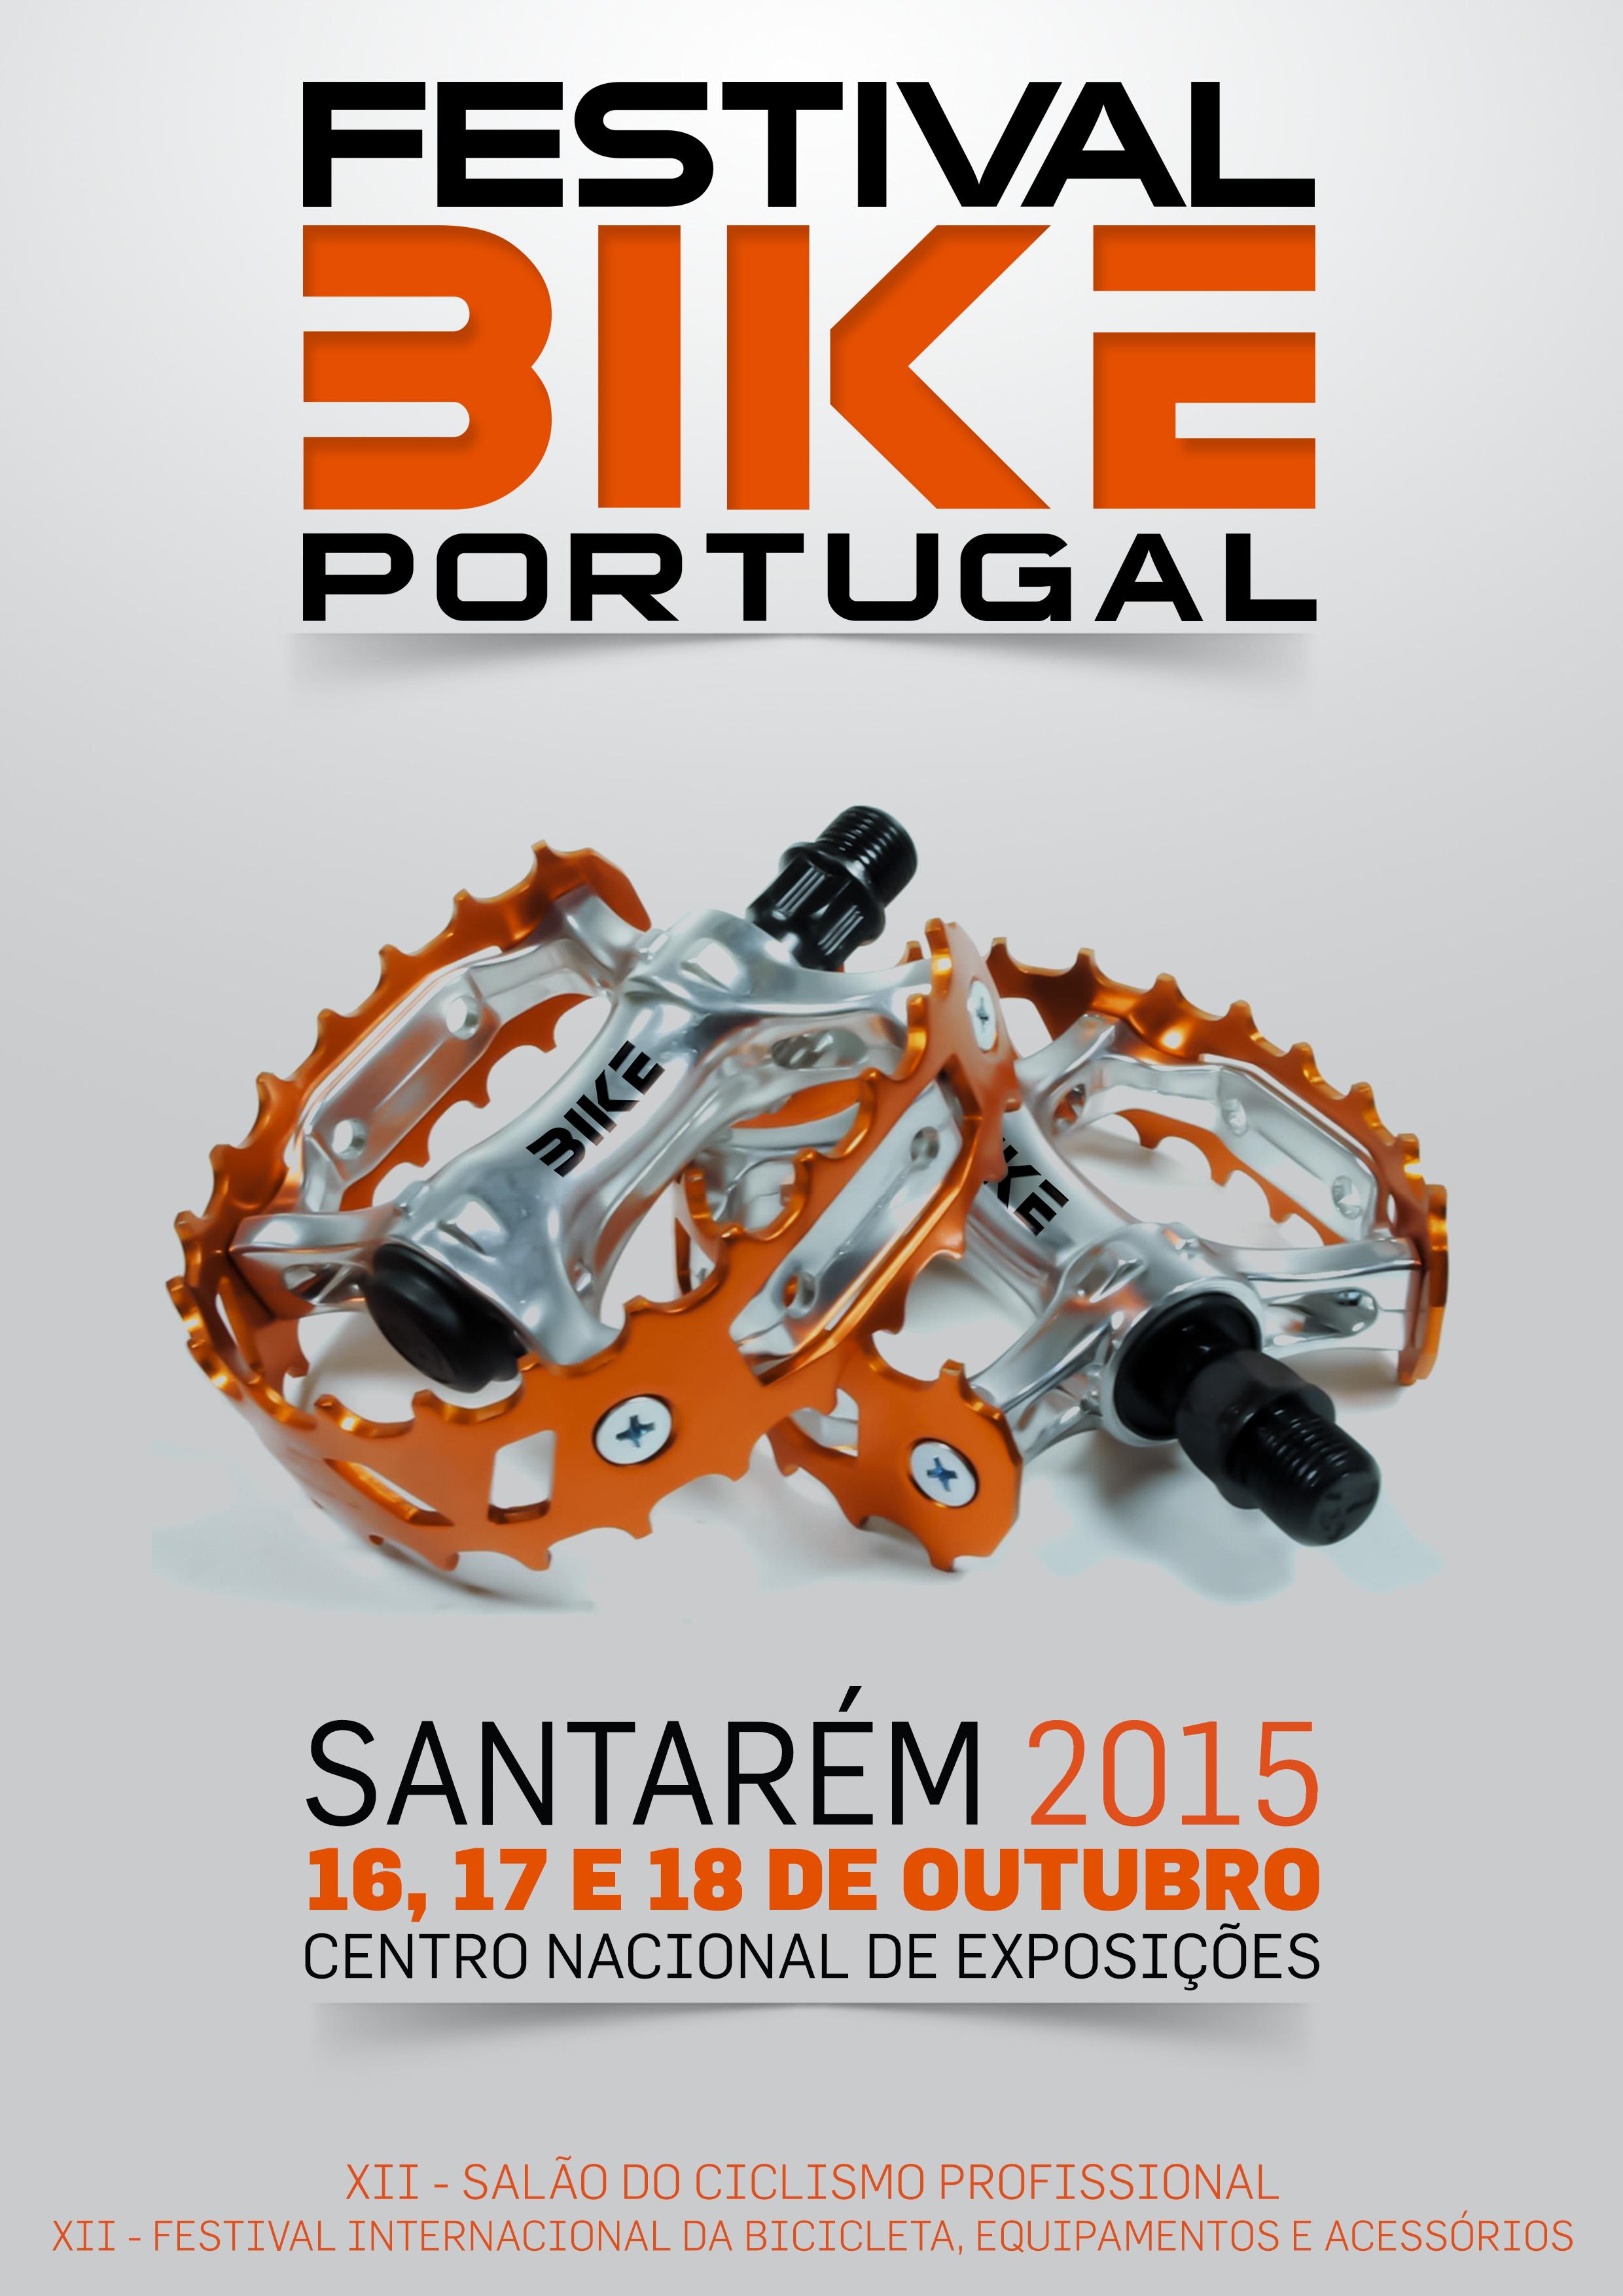 Festival Bike Portugal 2015